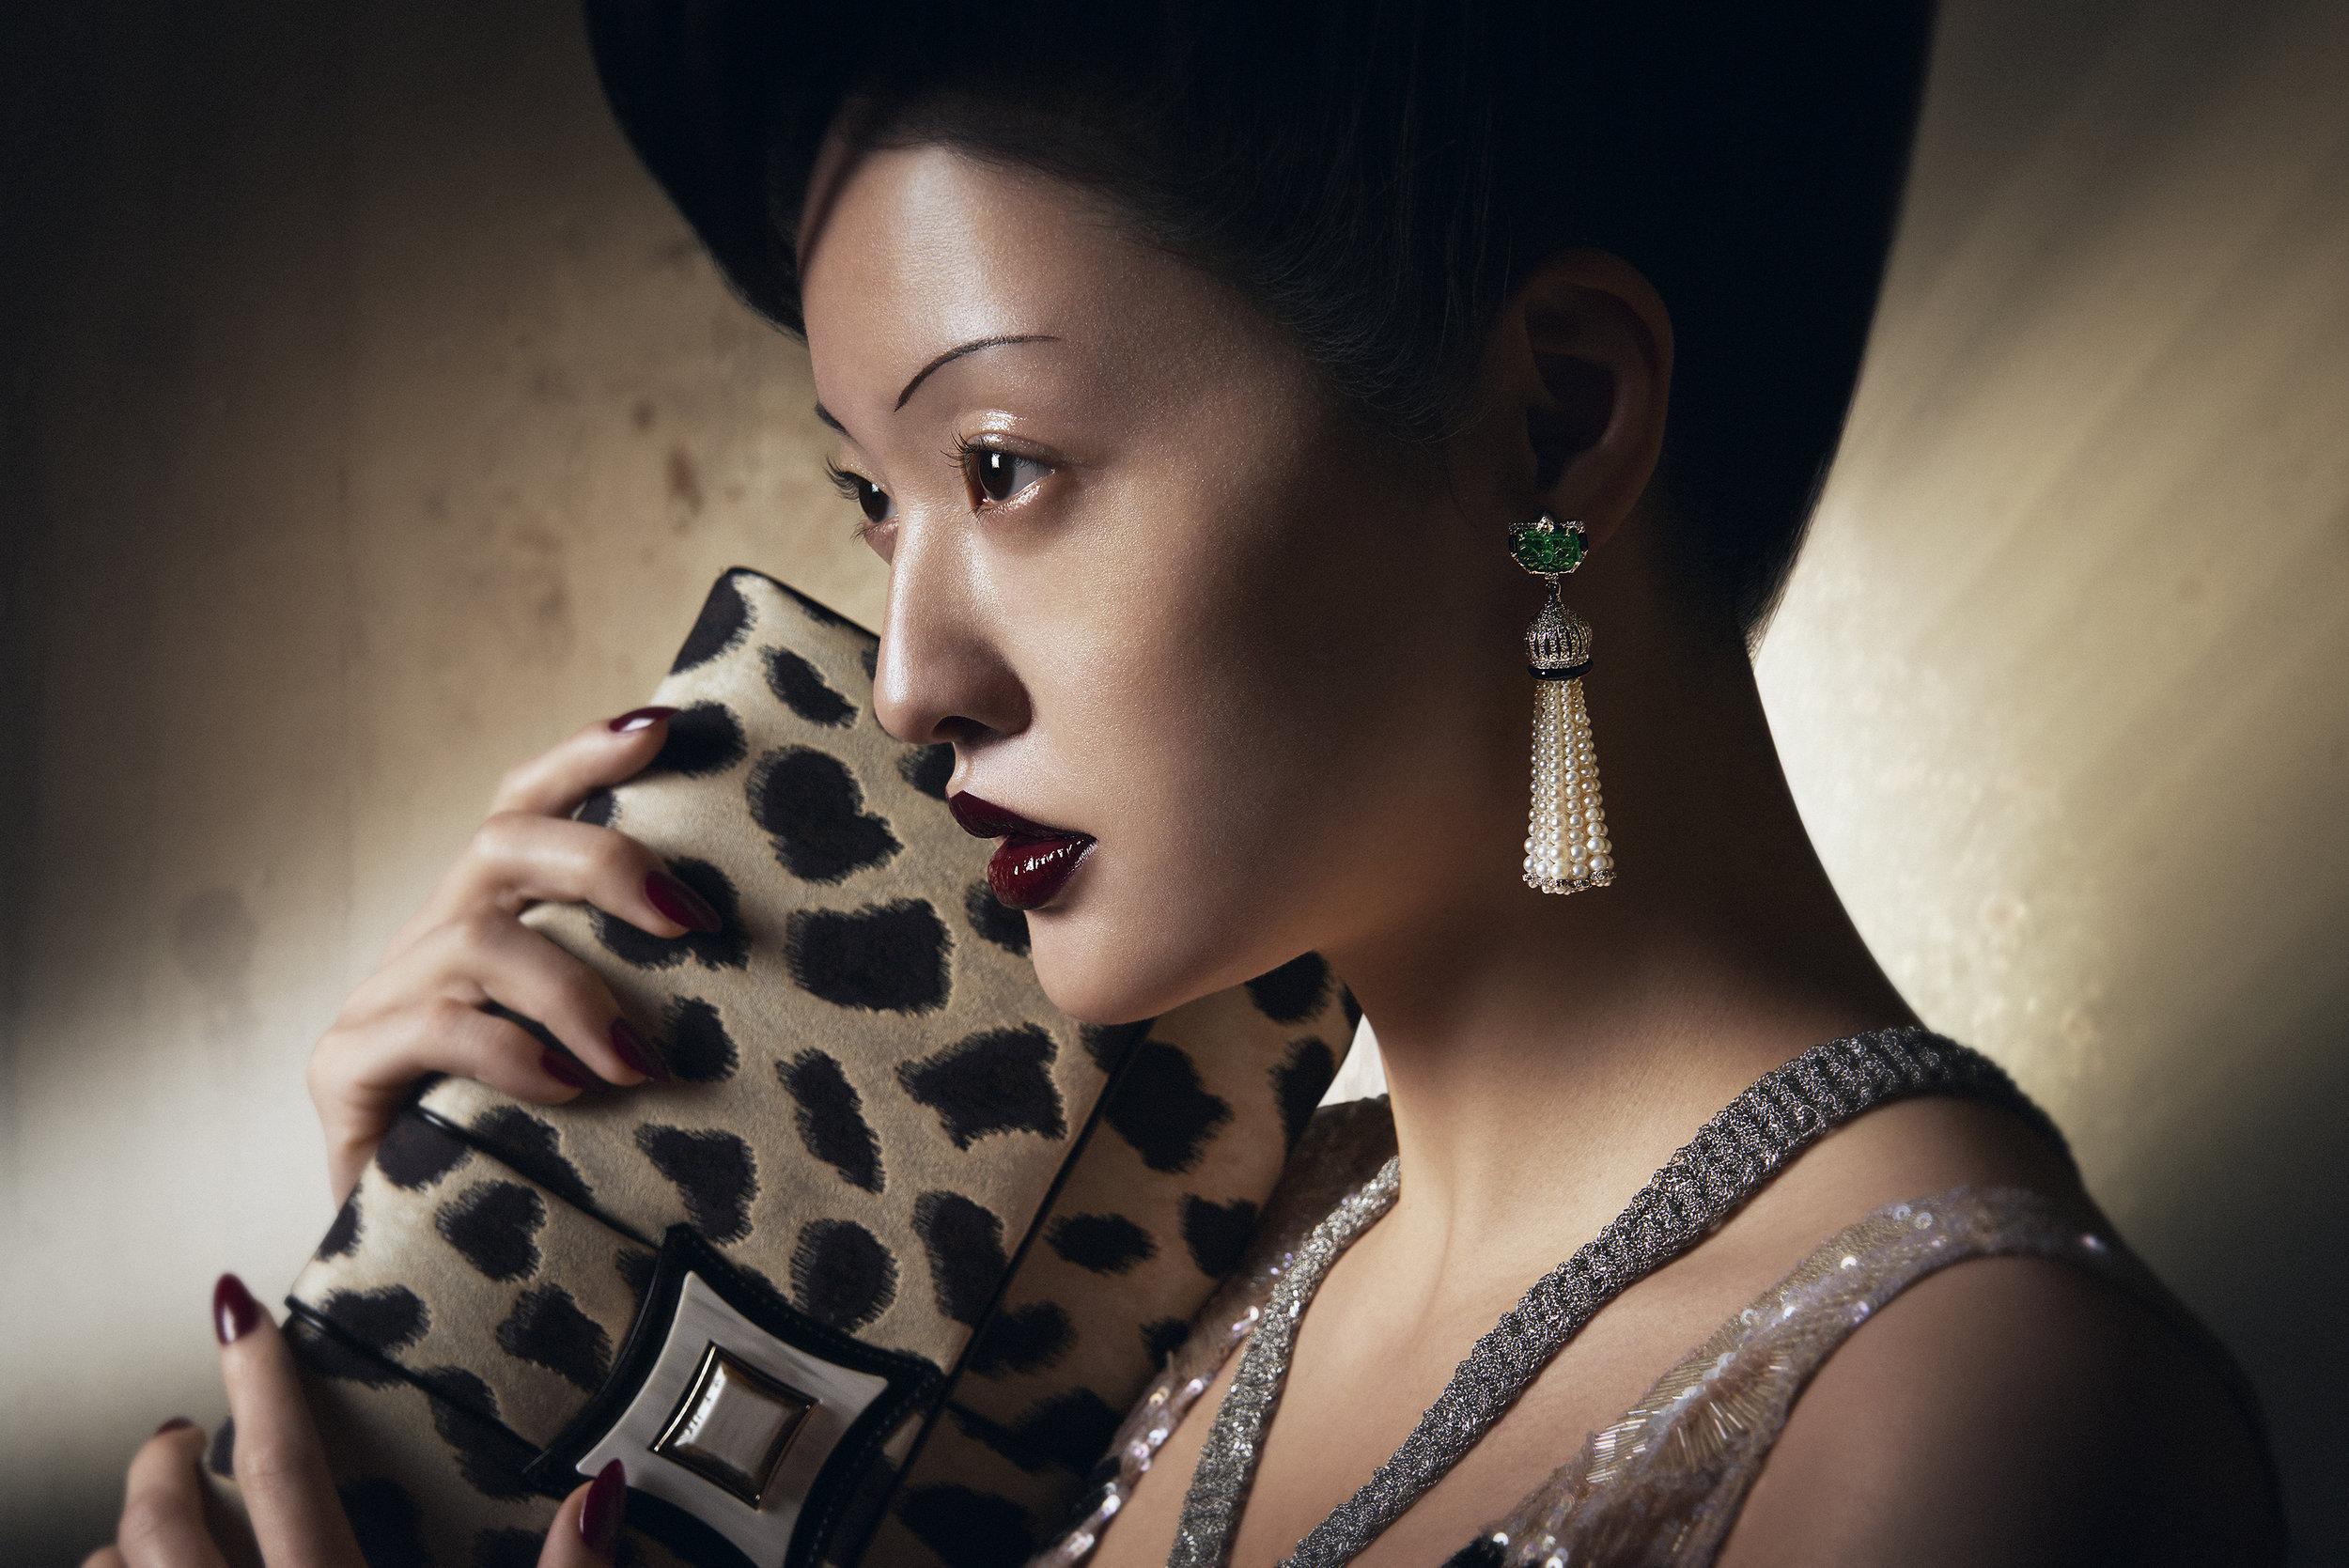 Giorgio Armani / George McLeod / Luxure Magazine